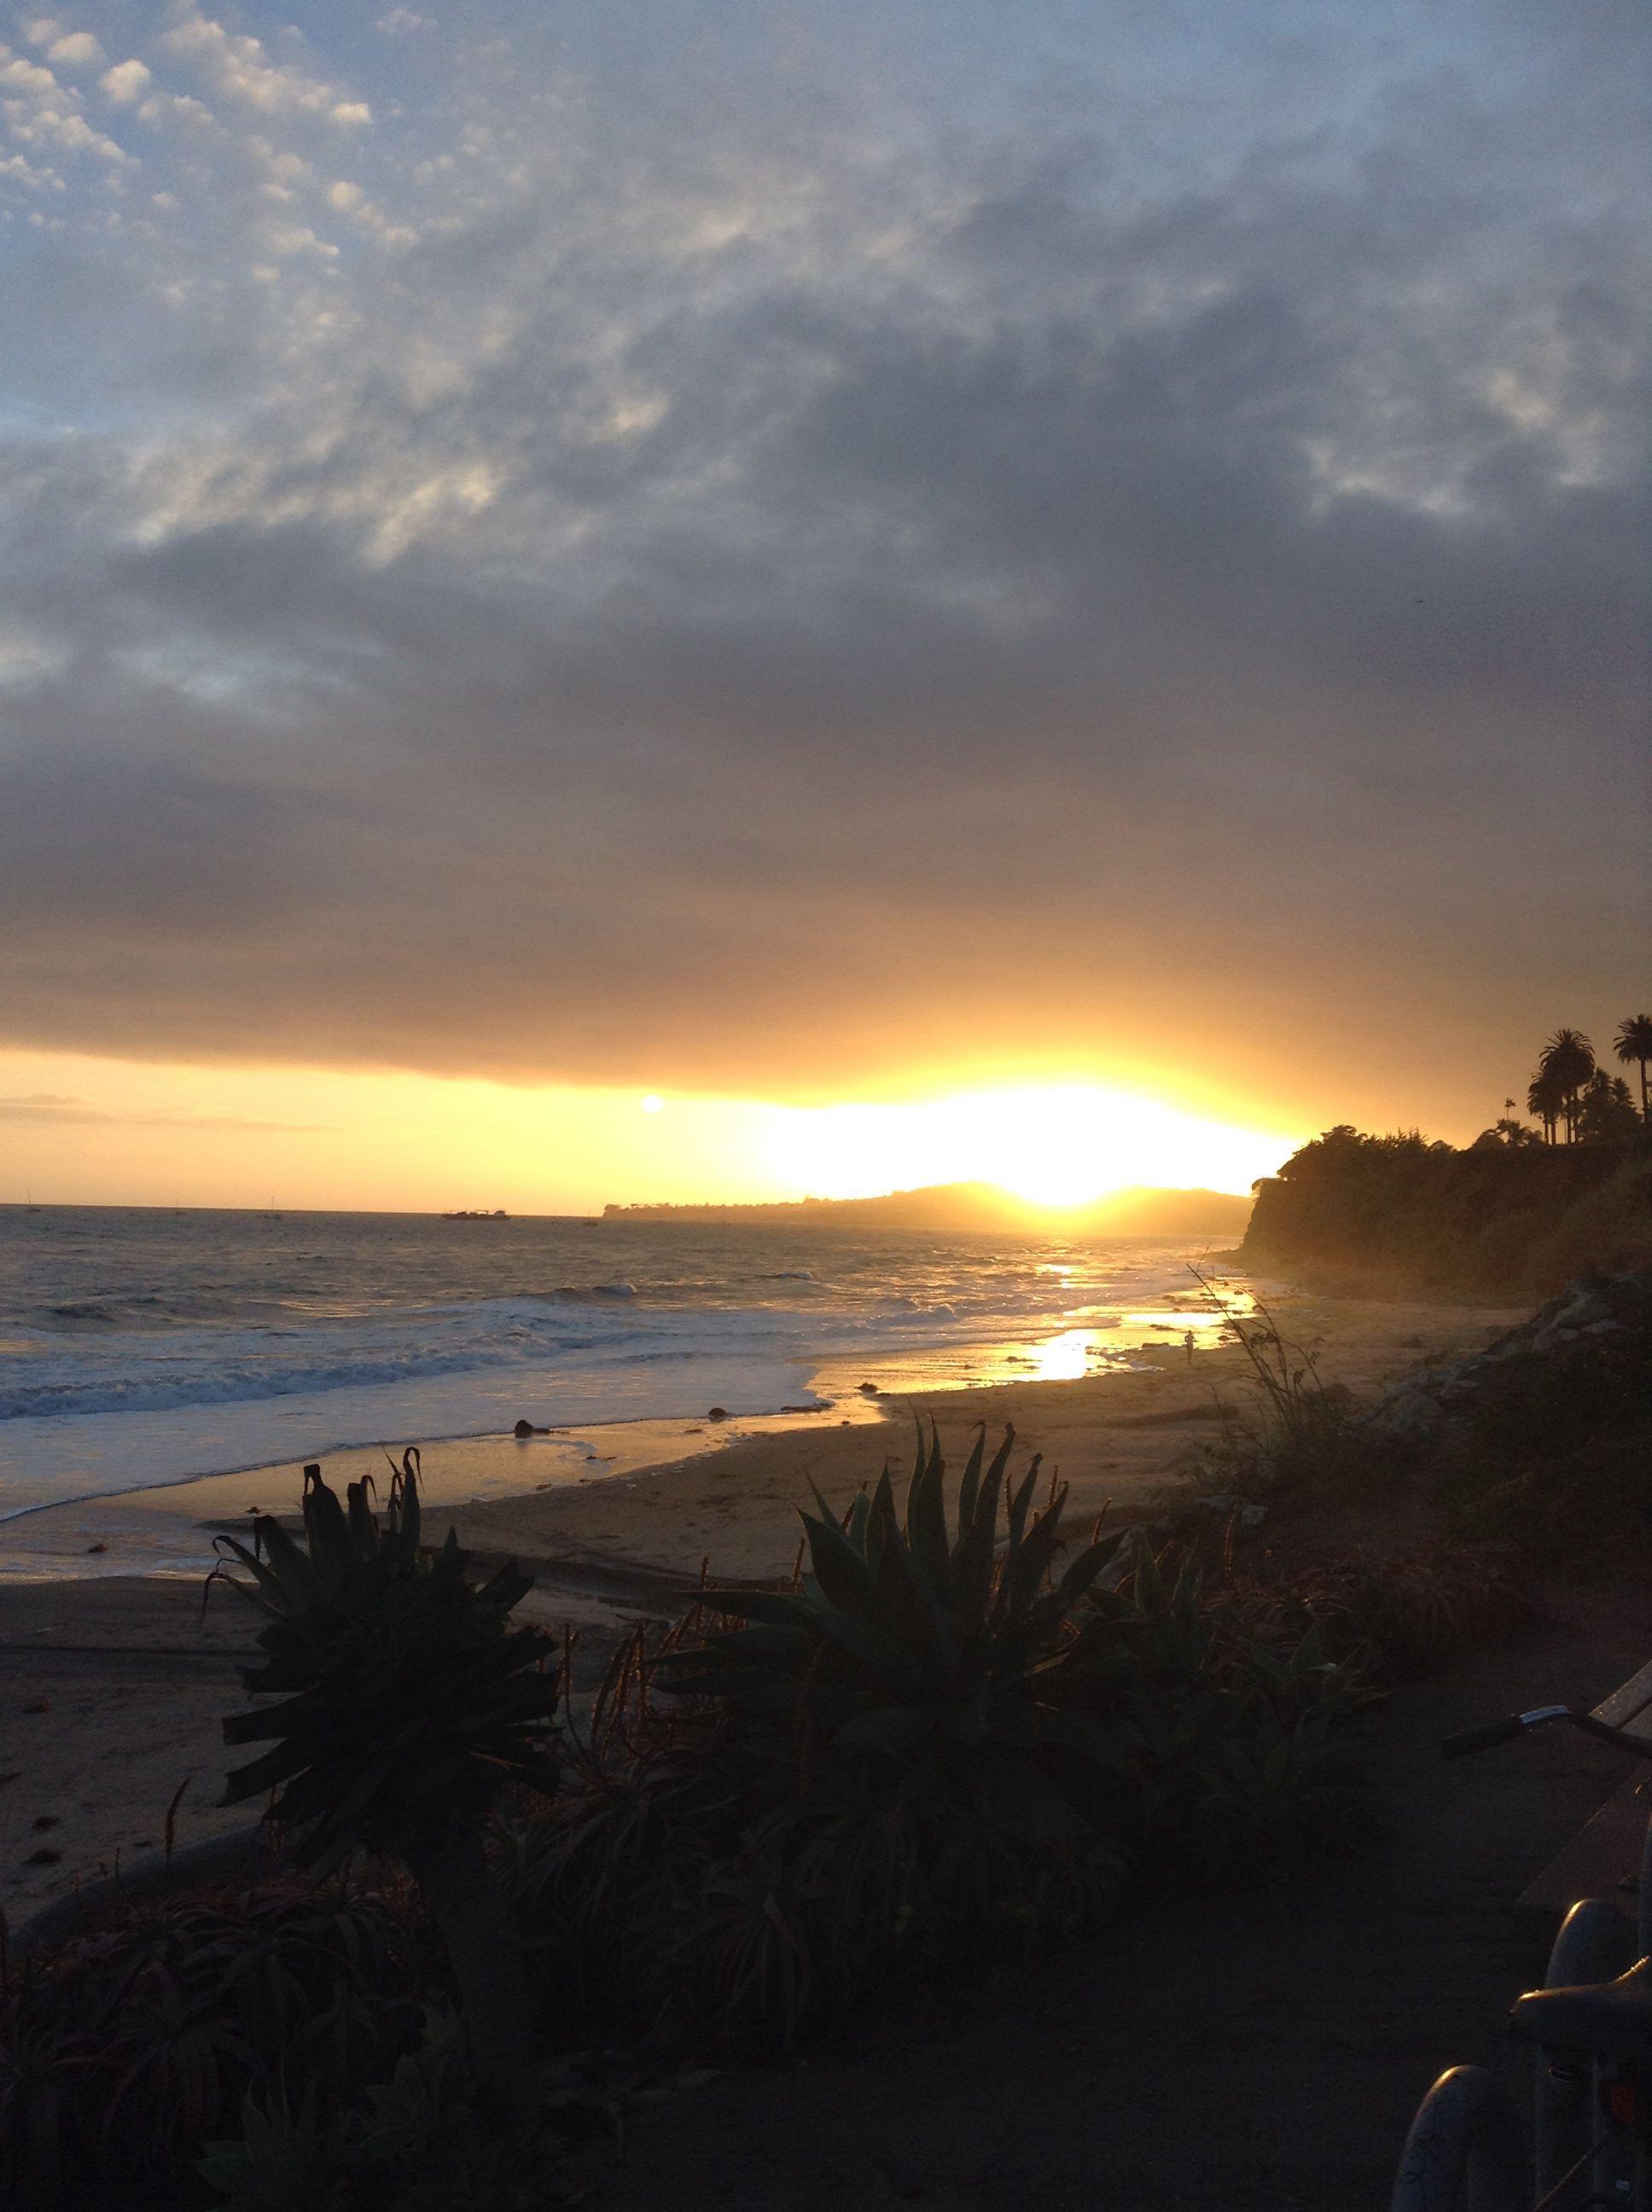 Erfly Beach After A Day Of Rain Four Seasons Santa Barbara